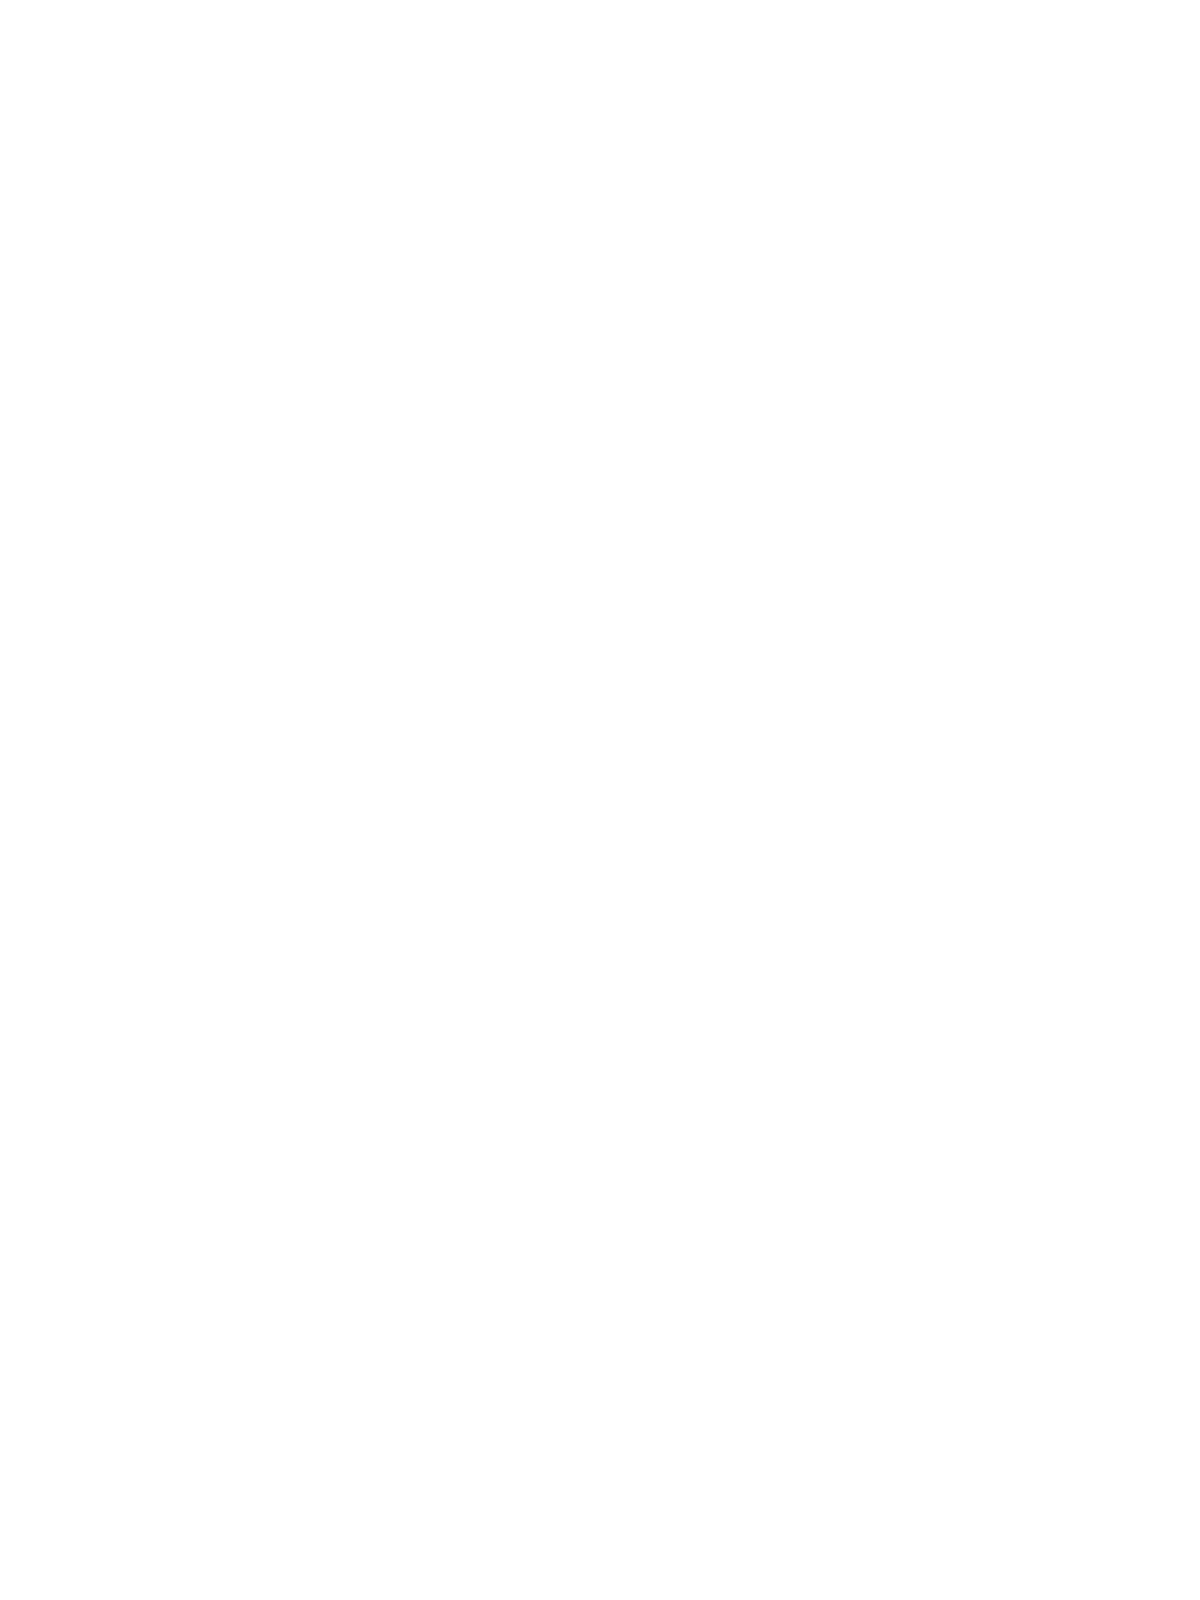 ATS-Abschnittsübung in Aldrans